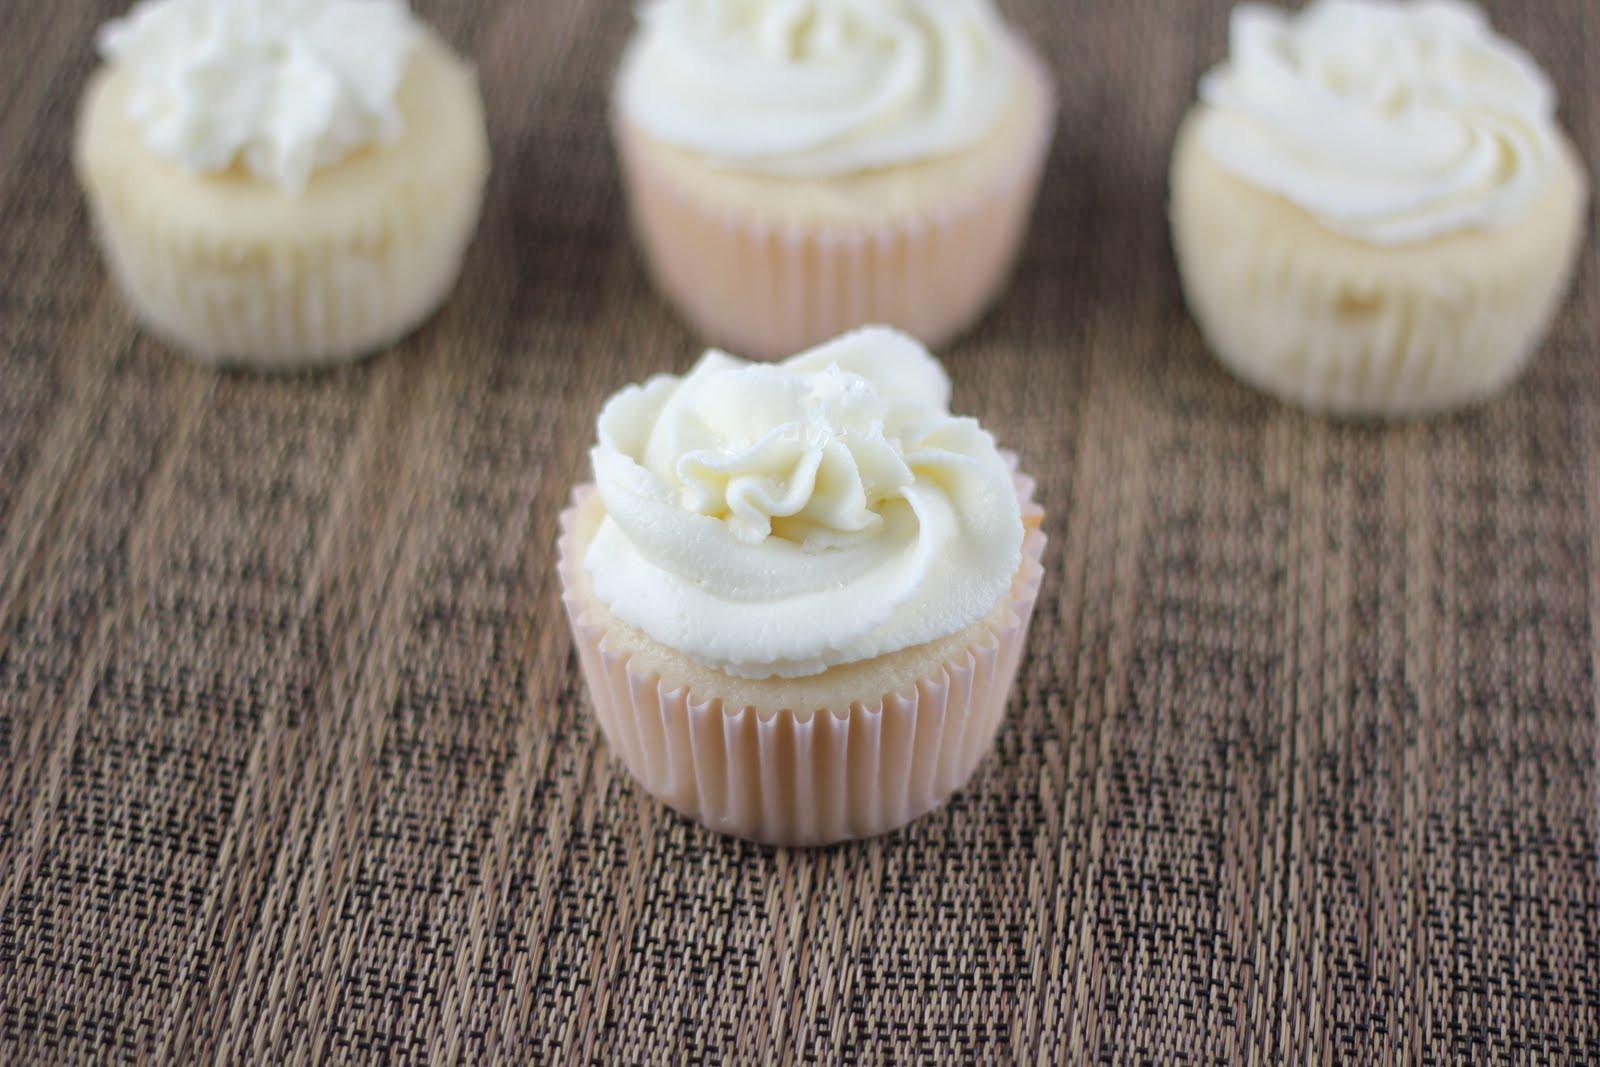 Wedding Cake Cupcakes Recipes  White Wedding Cake Cupcakes A Zesty Bite